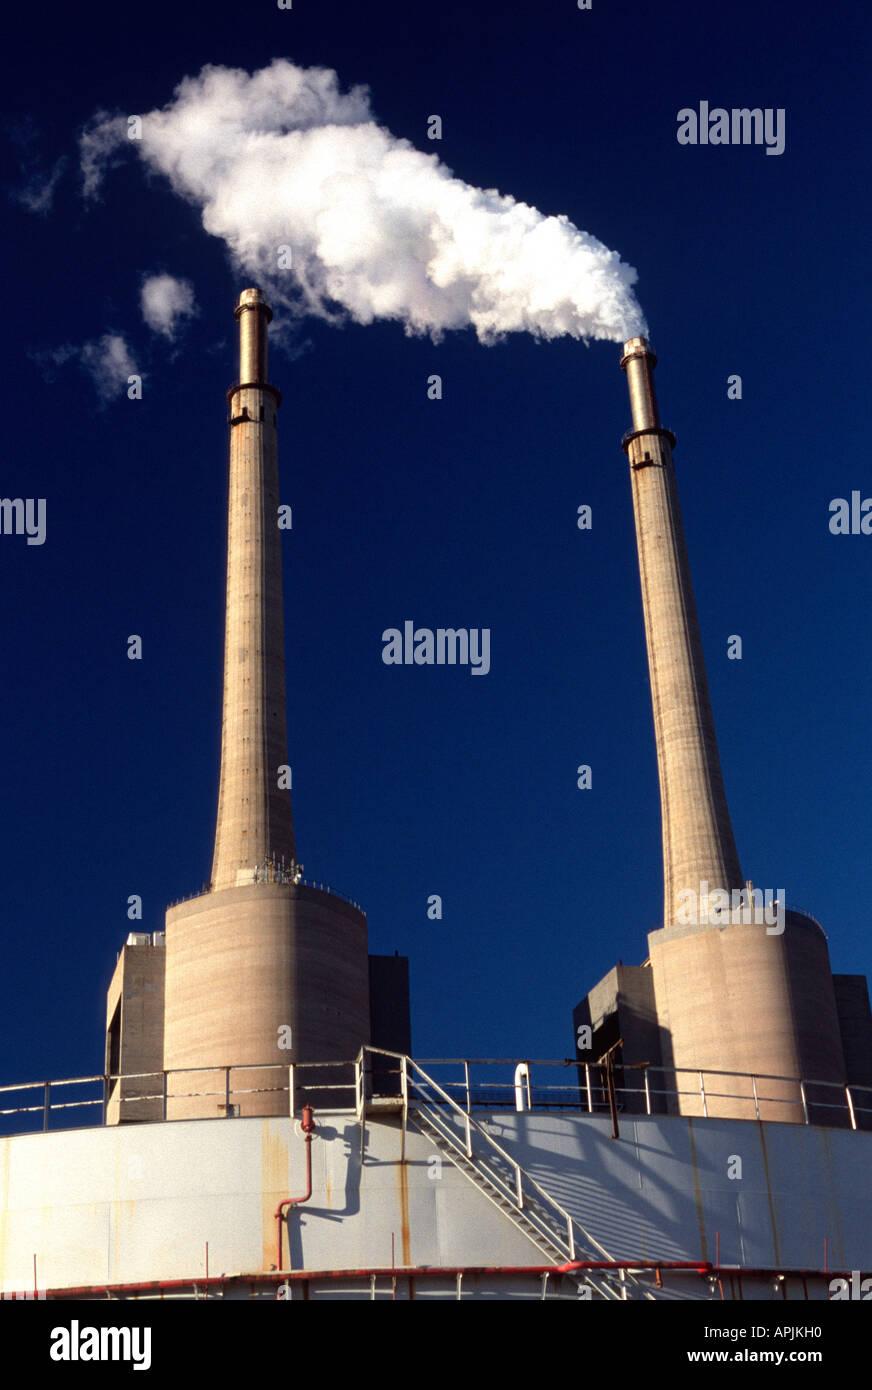 Power plant. - Stock Image